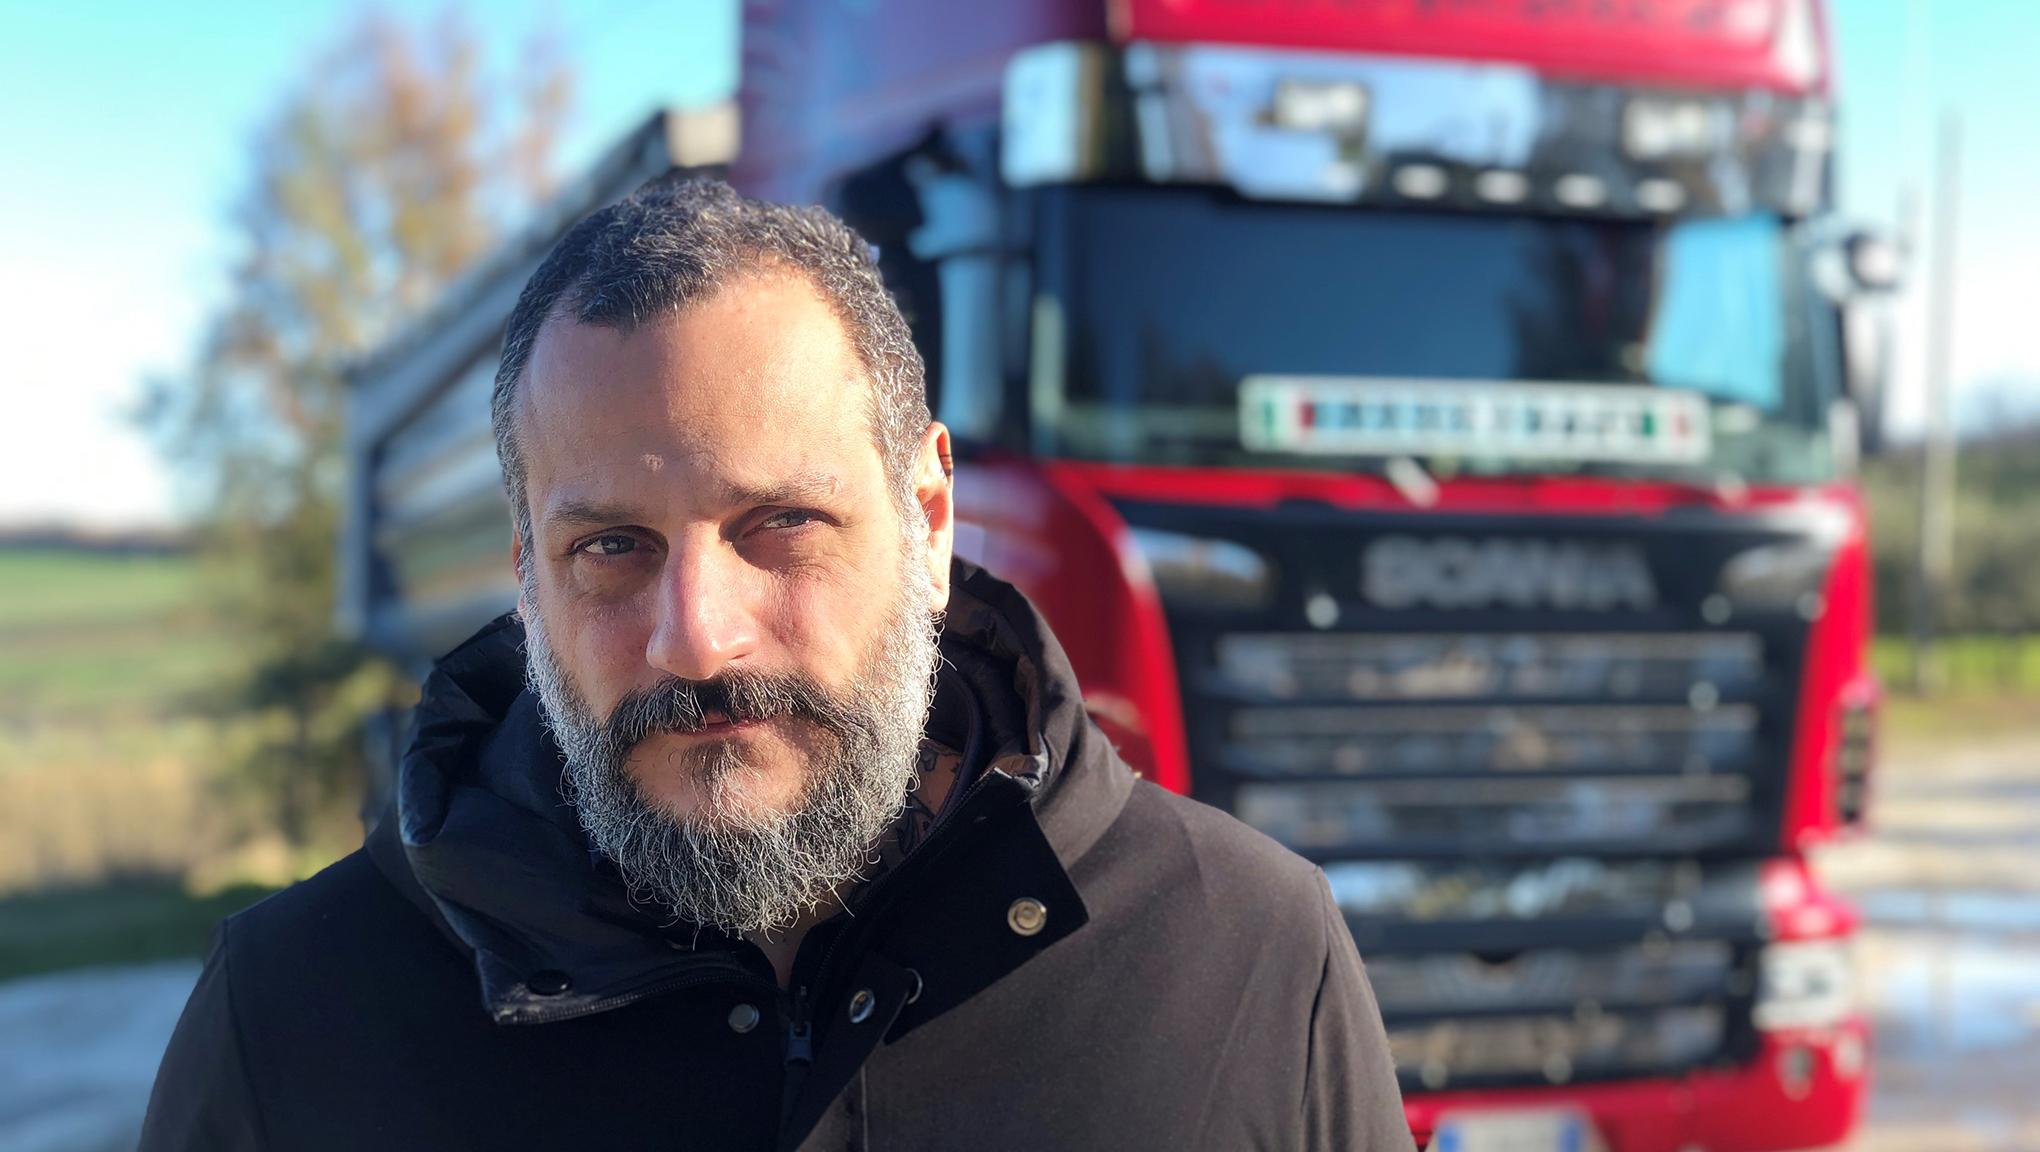 Nove Camionisti in trattoria